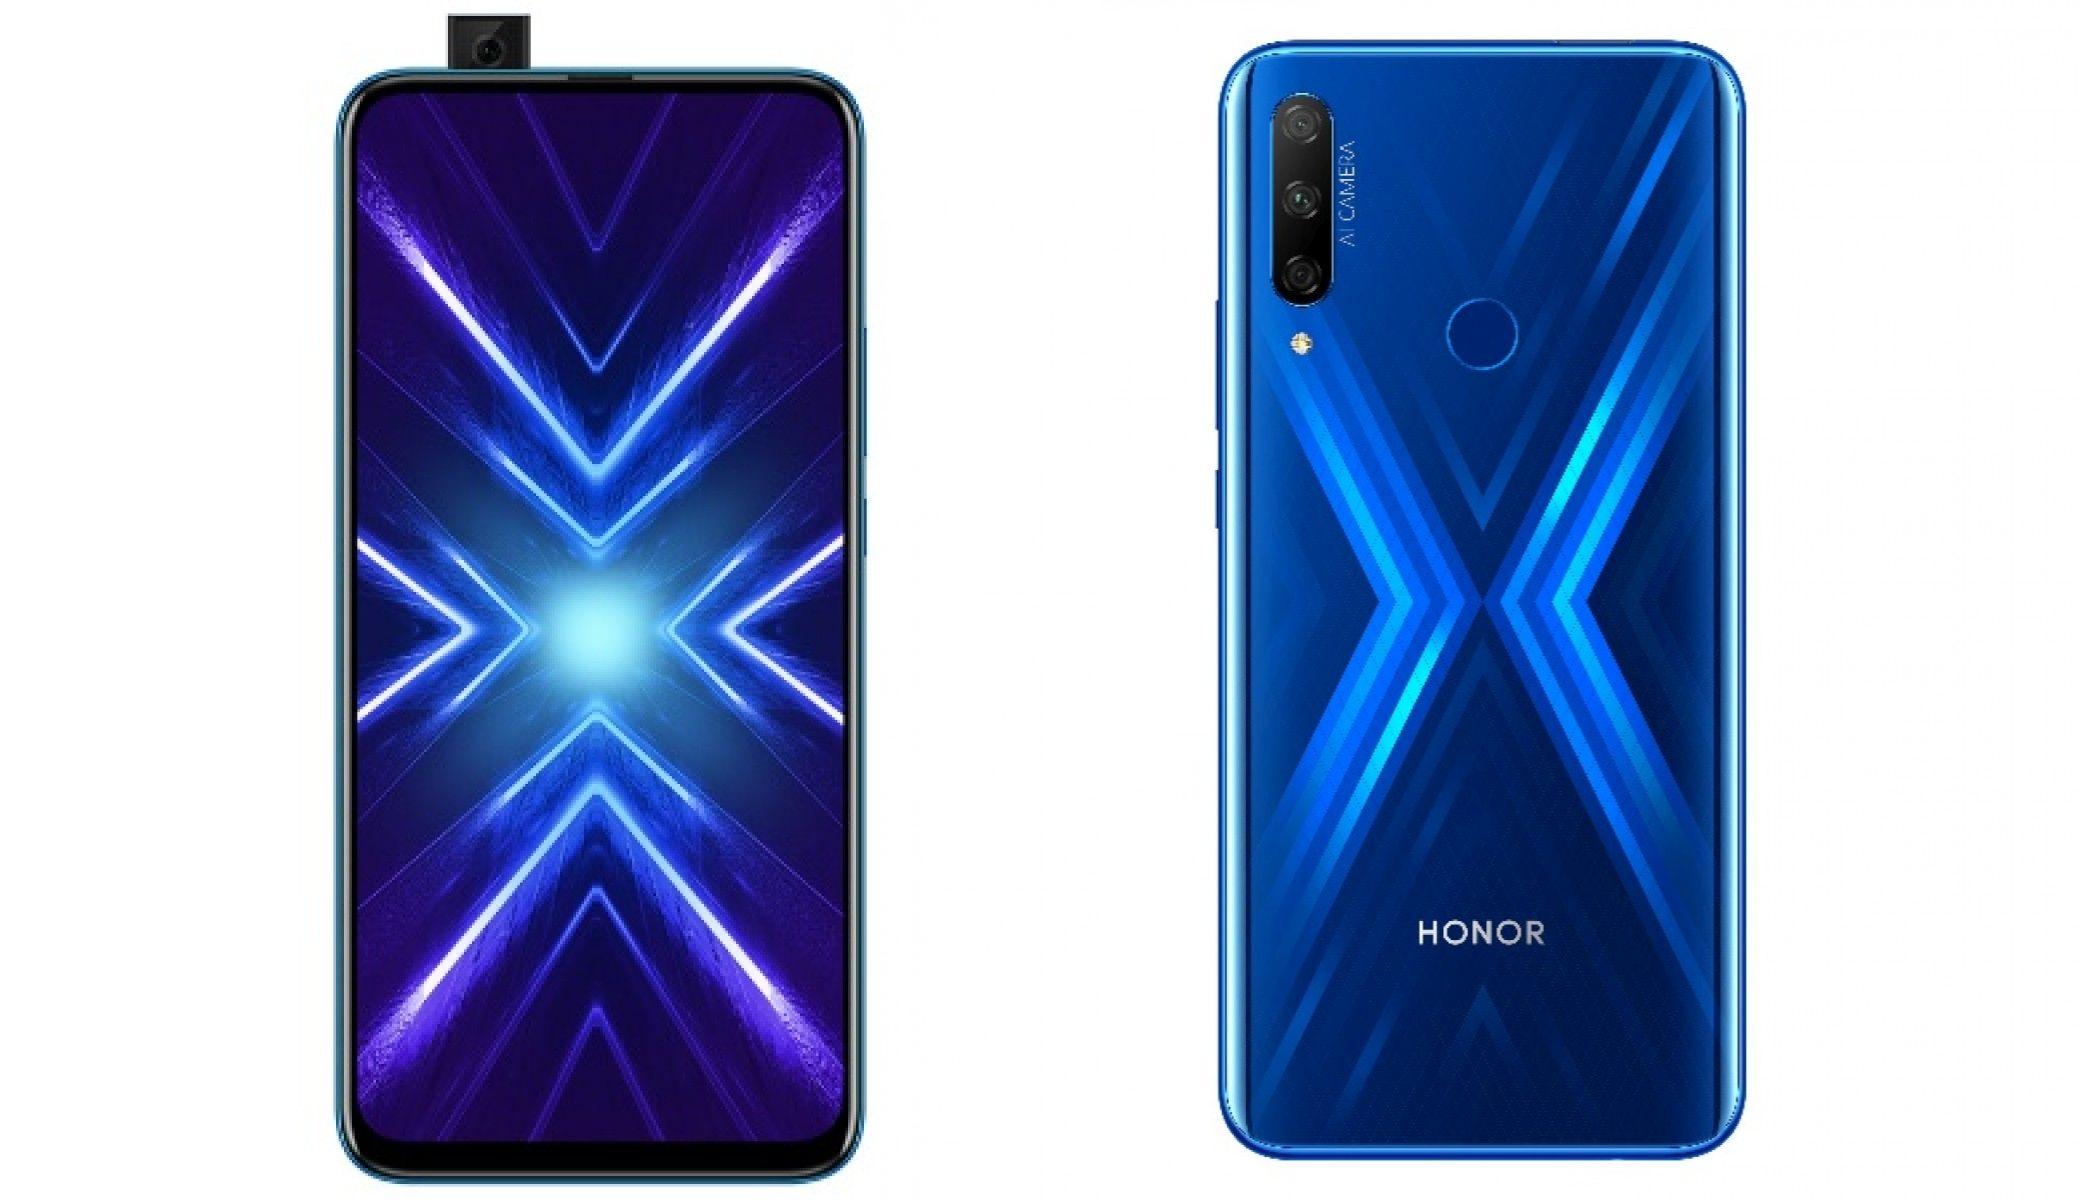 Honor 9X international edition has Kirin 710F